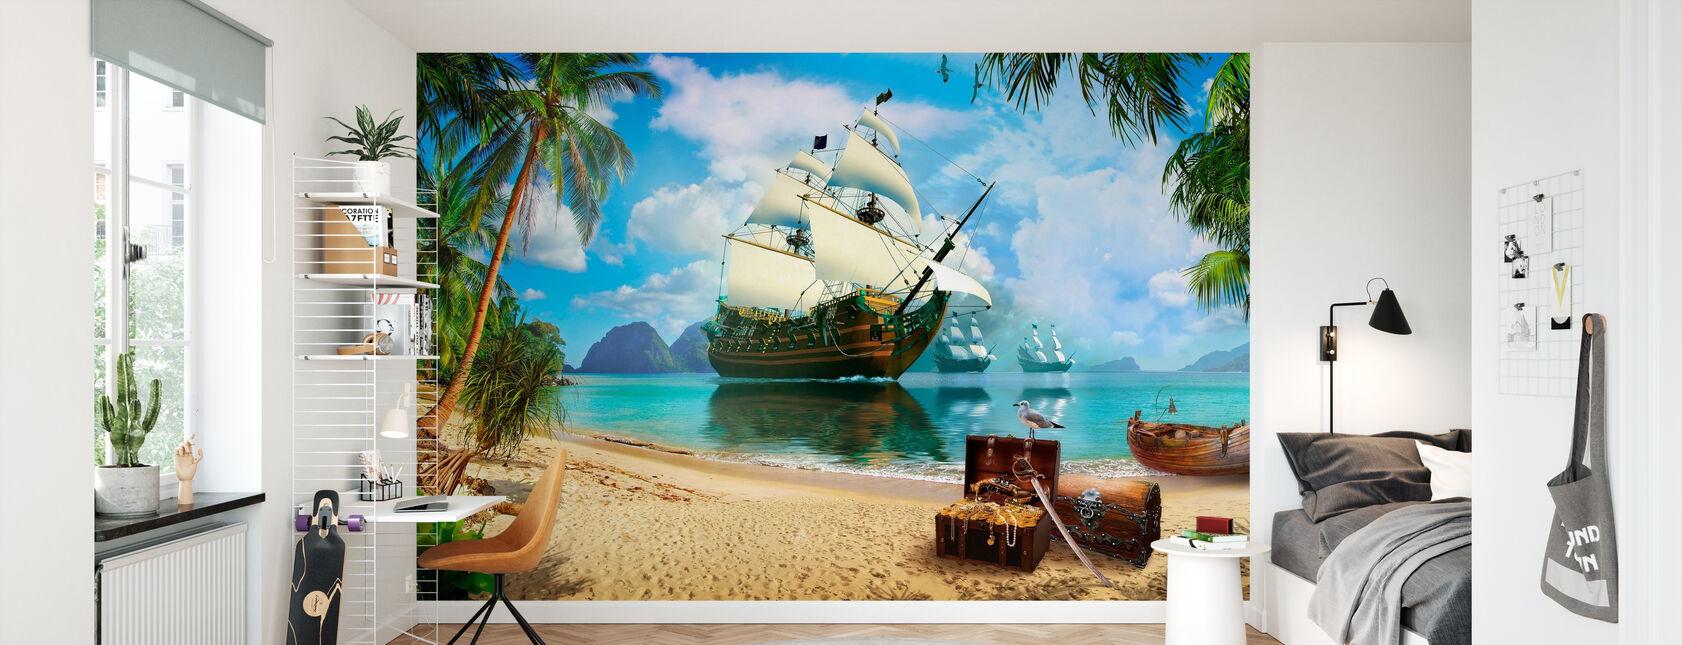 Pirate Treasure Island - Tapet - Barnrum